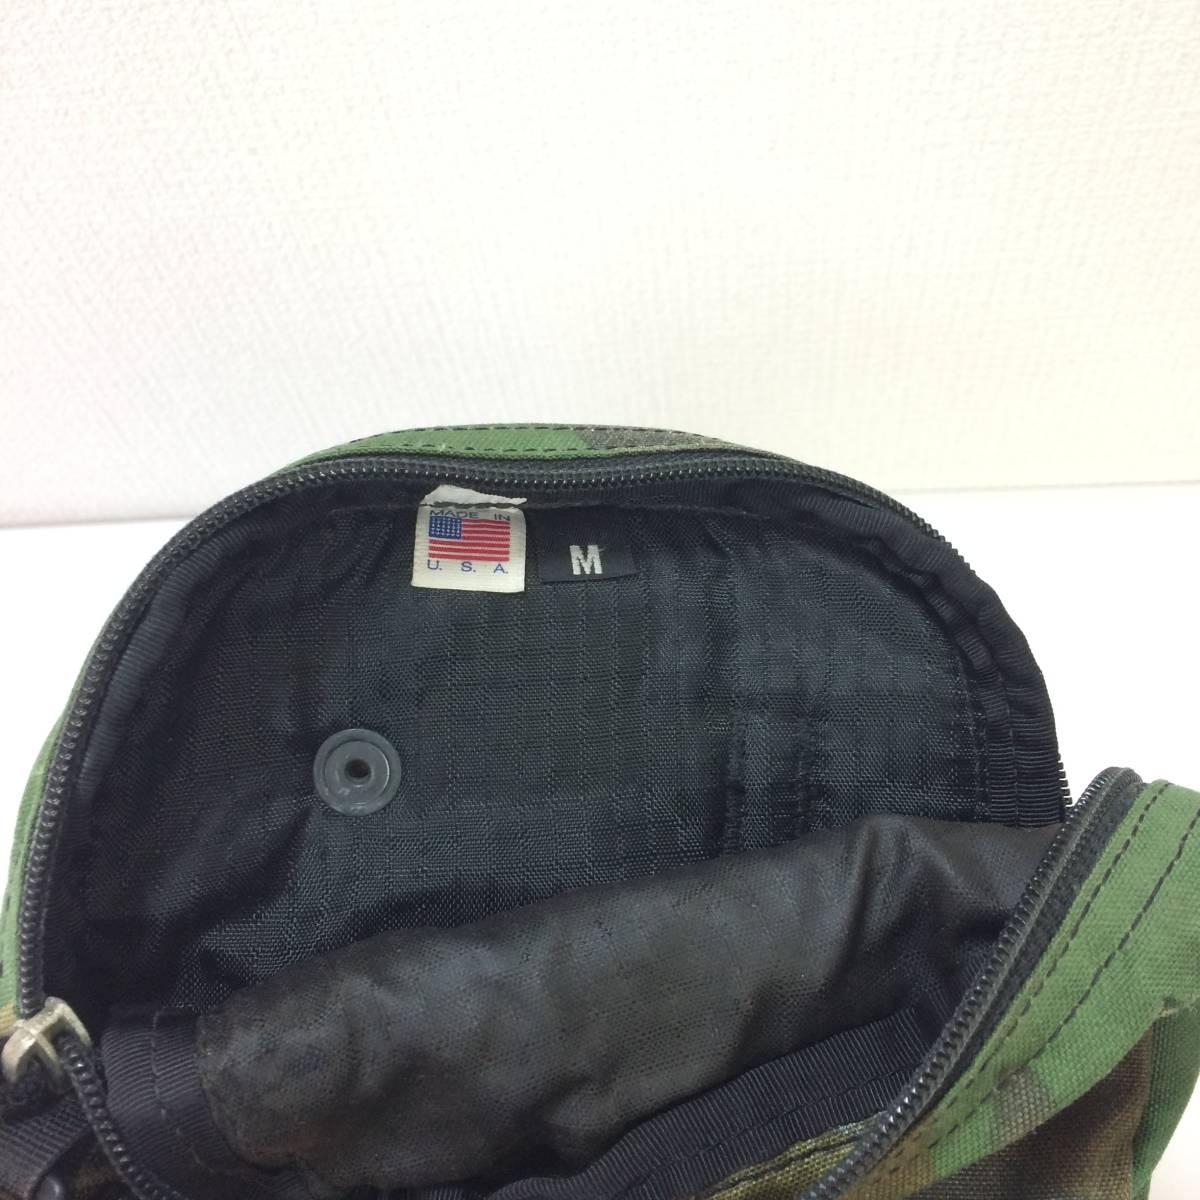 USA製 グレゴリー クイックポケットM 迷彩 カモフラ ウッドランドカモ ショルダーポーチ ポシェット